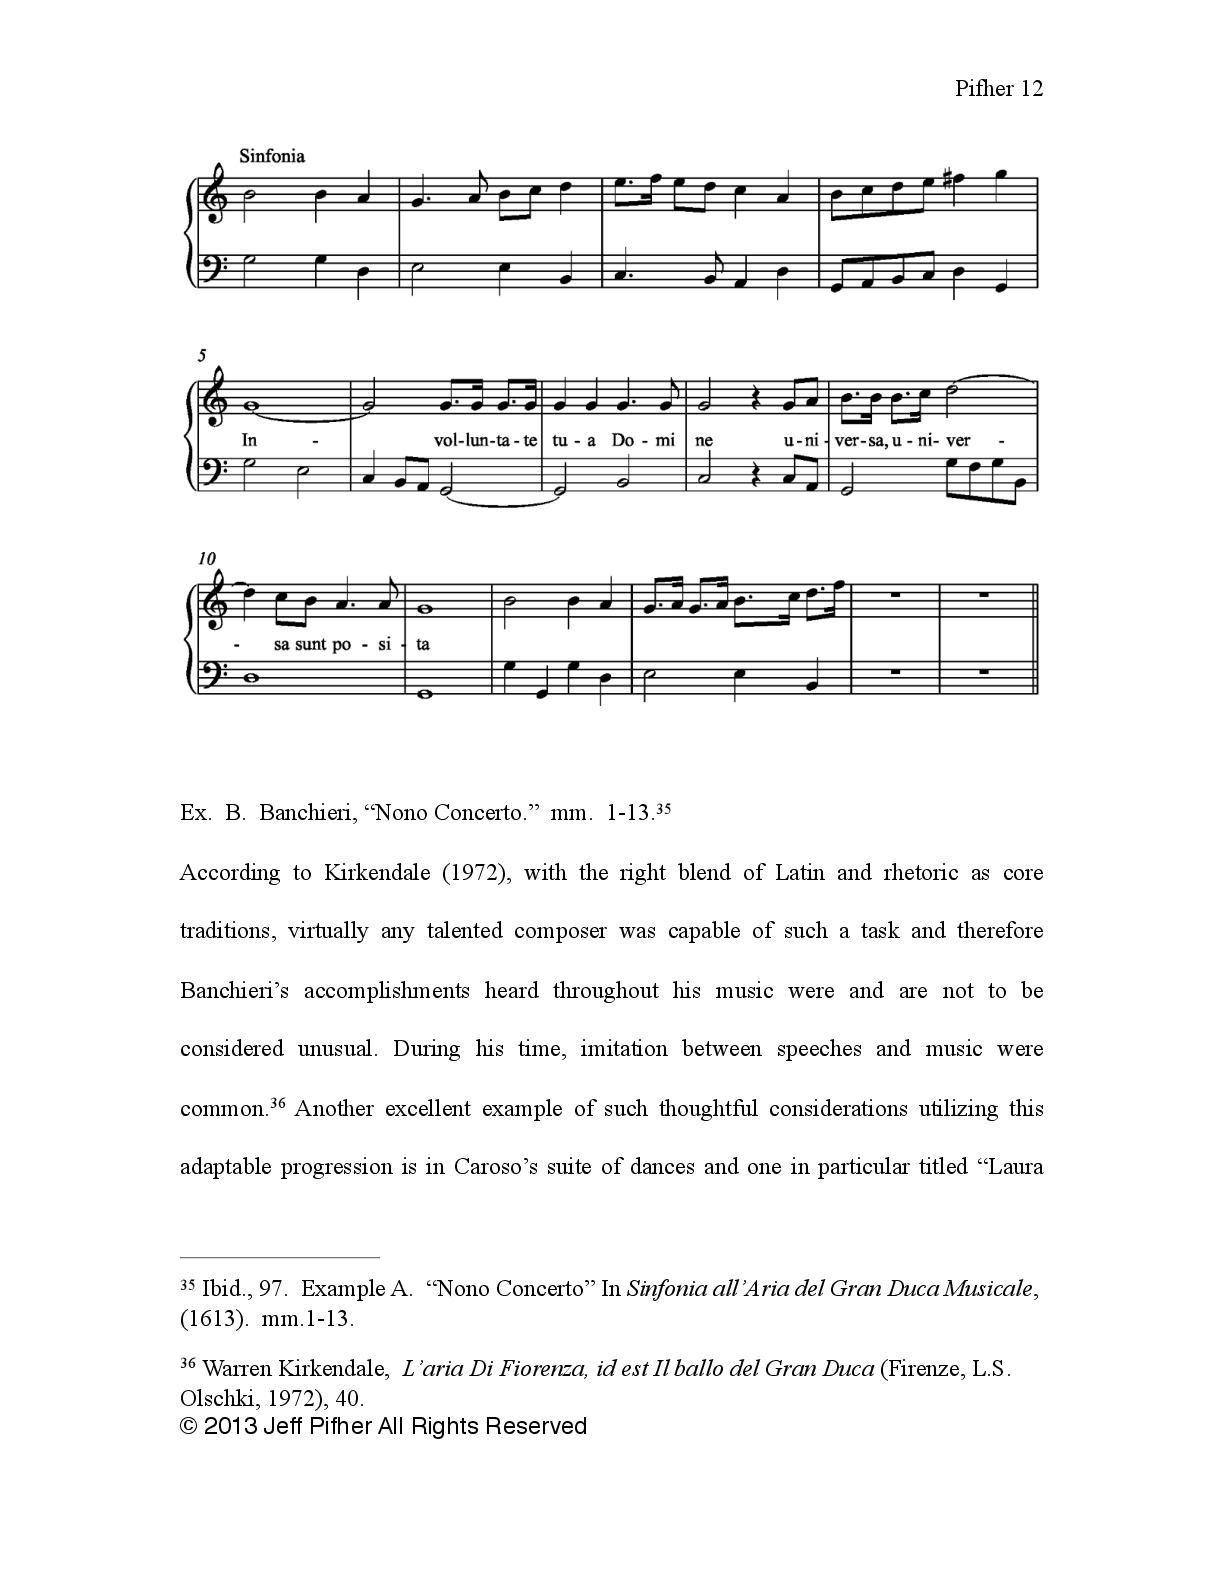 Jeff-Pifher-Music-and-Mediciean-Influences-(Academic-Series)-012.jpg